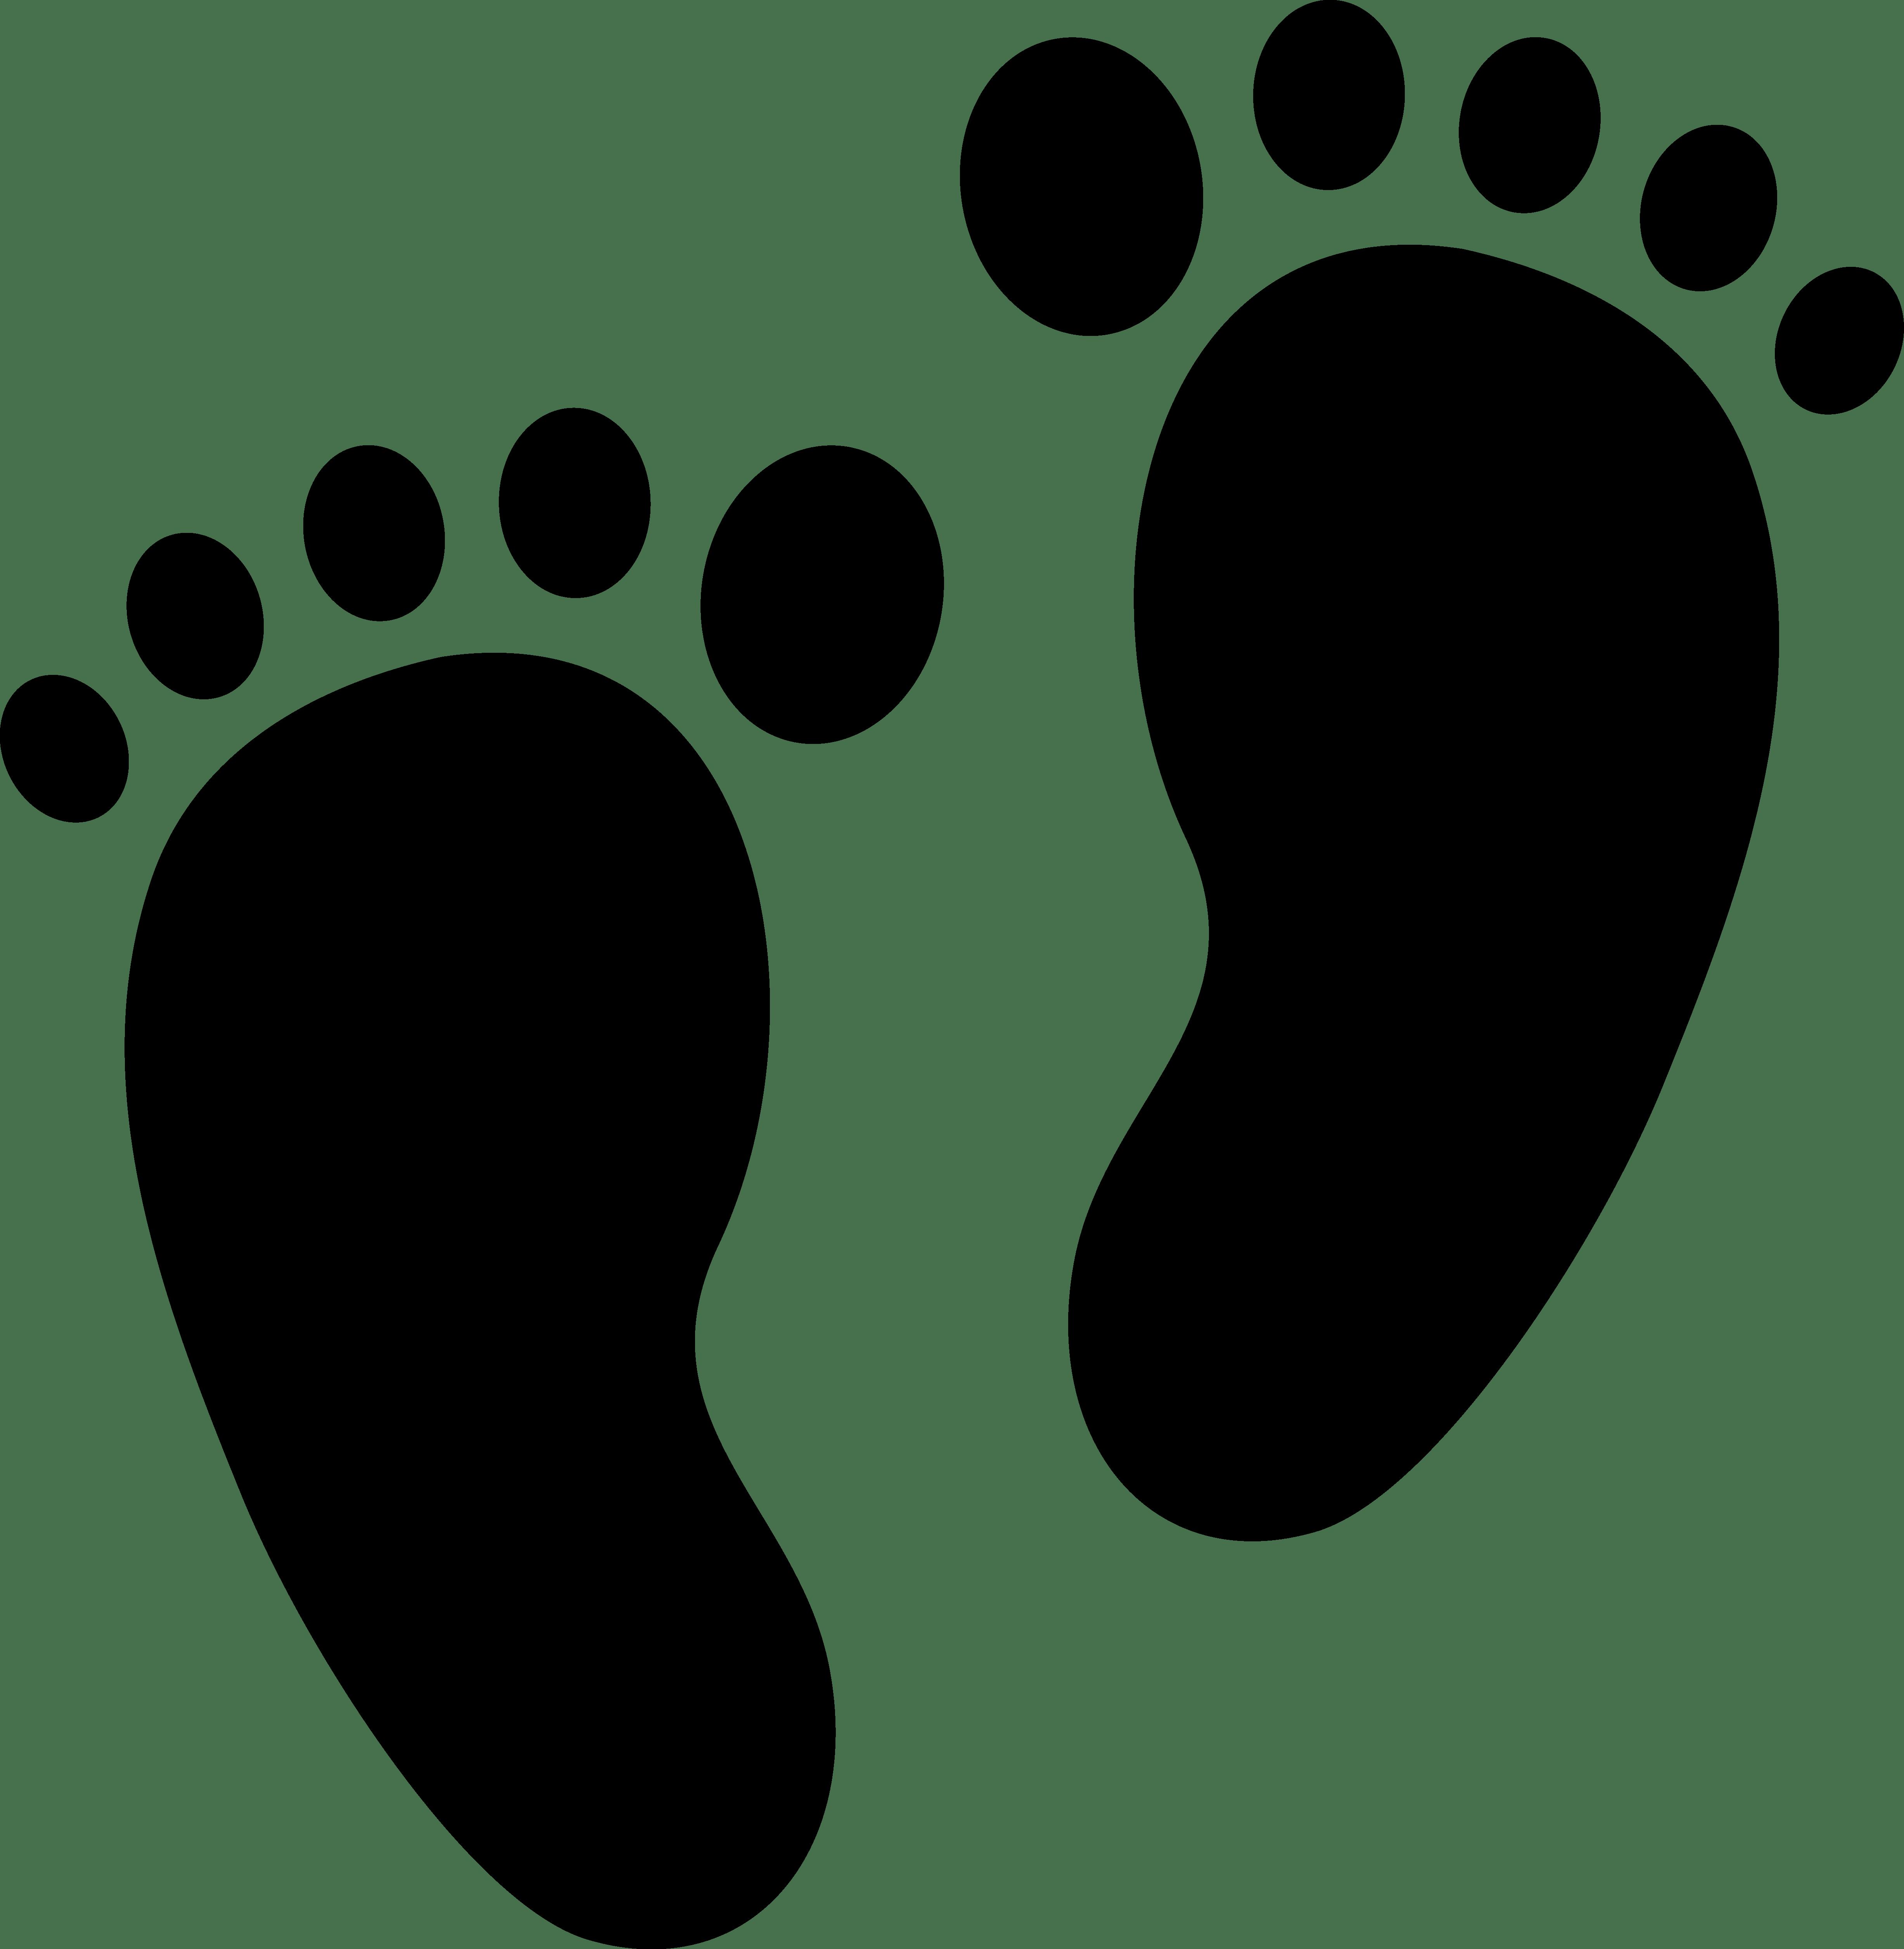 Download wallpaper toes full. Feet clipart toe